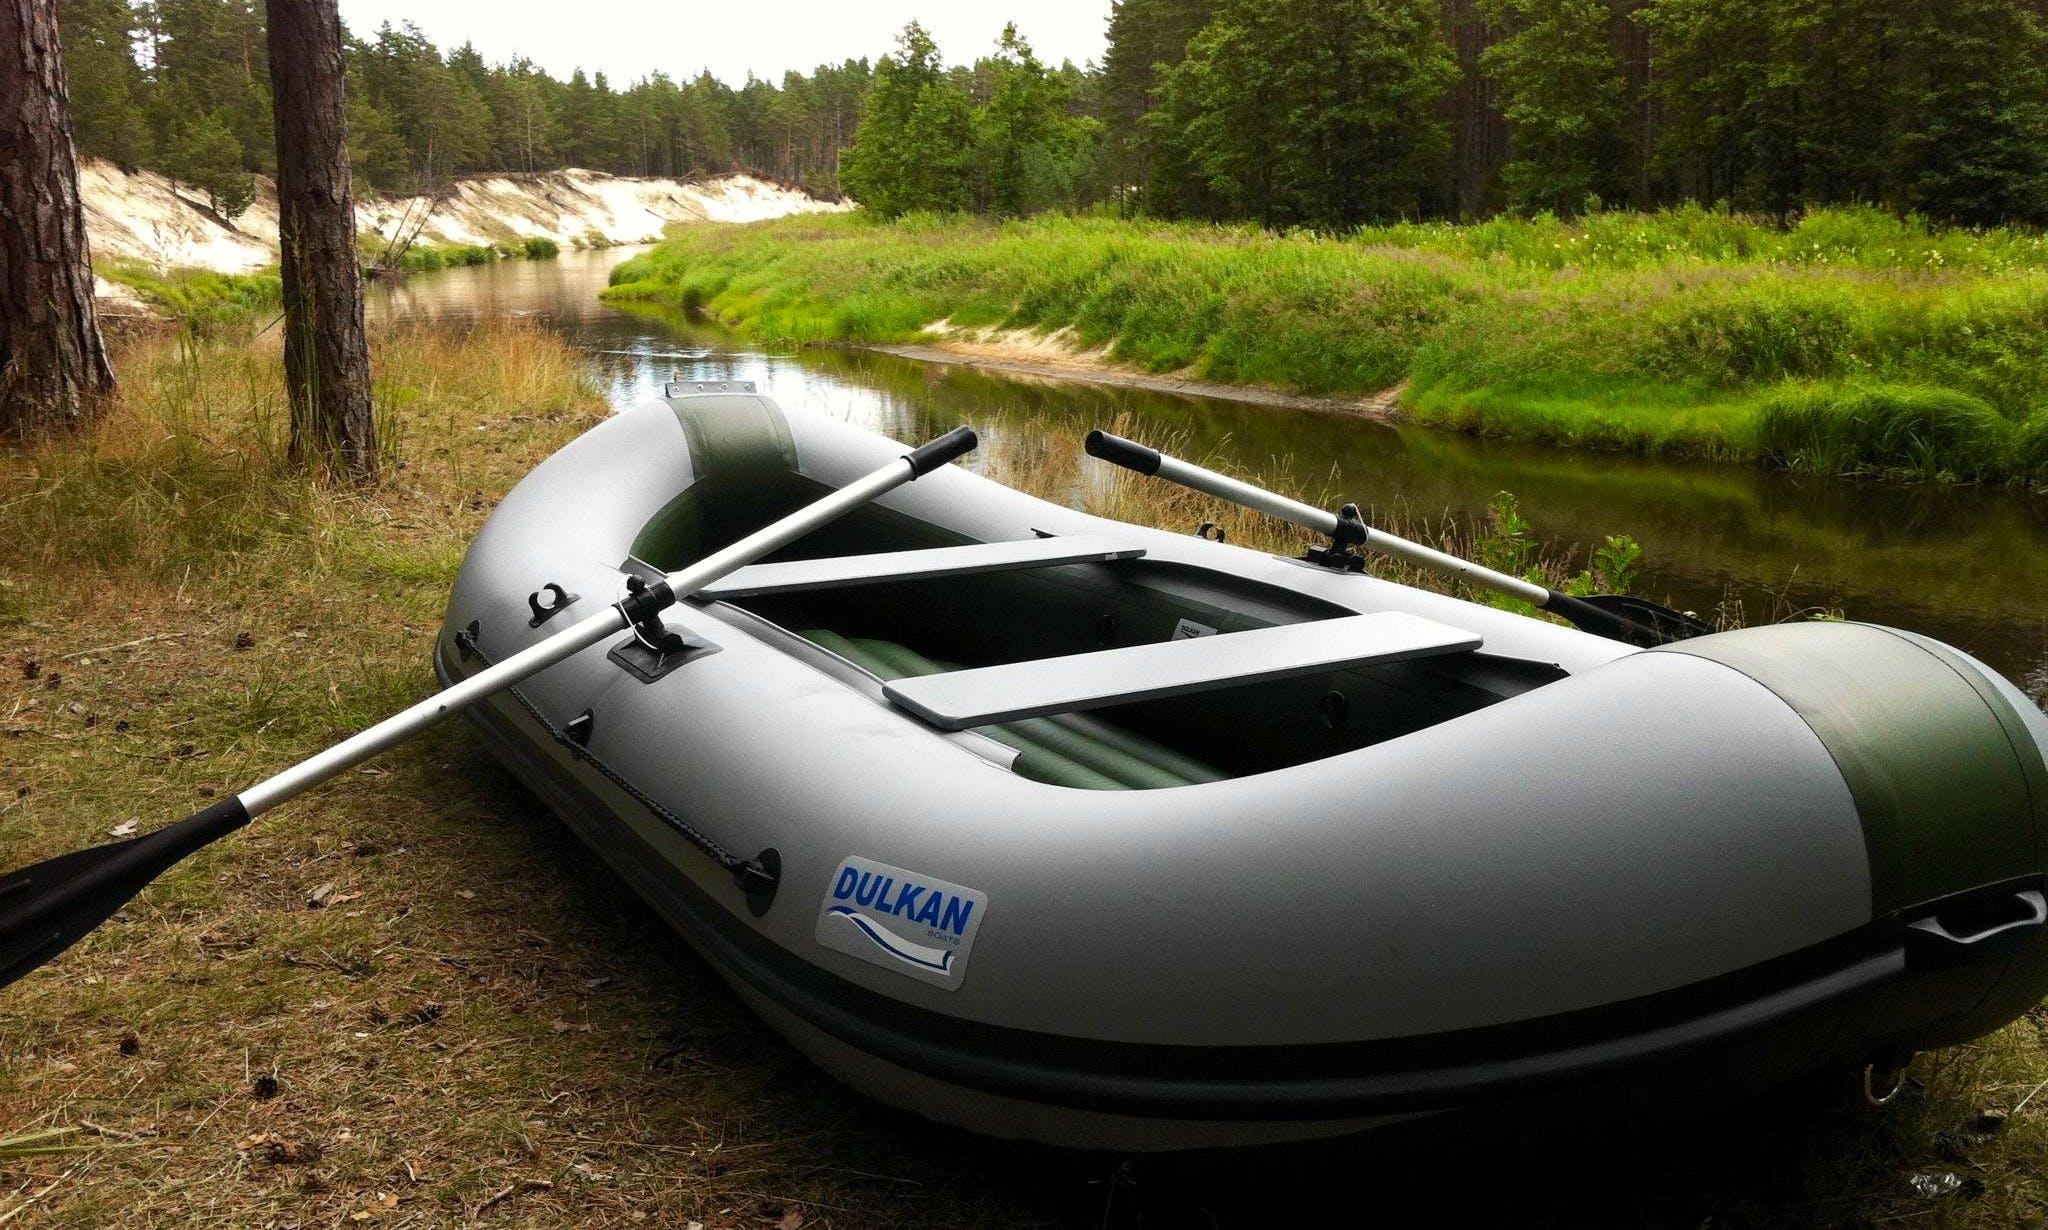 Rent a Dulkan Raft for 4 People in Rīga, Latvia